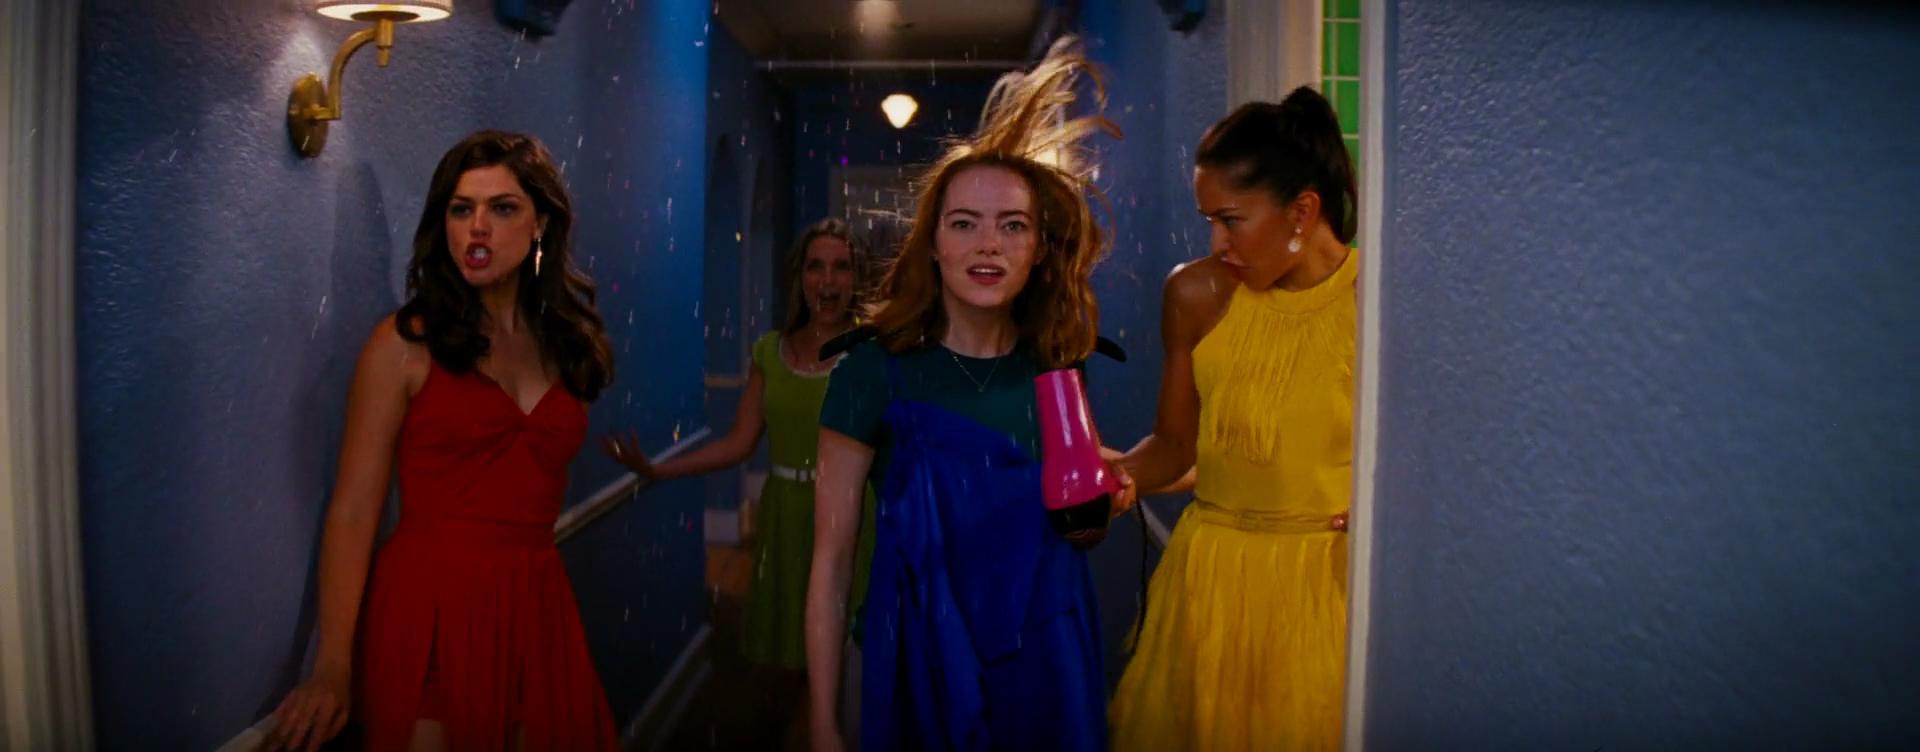 Emma Stone, Jessica Rothe, Sonoya Mizuno, and Callie Hernandez in La La Land (2016)